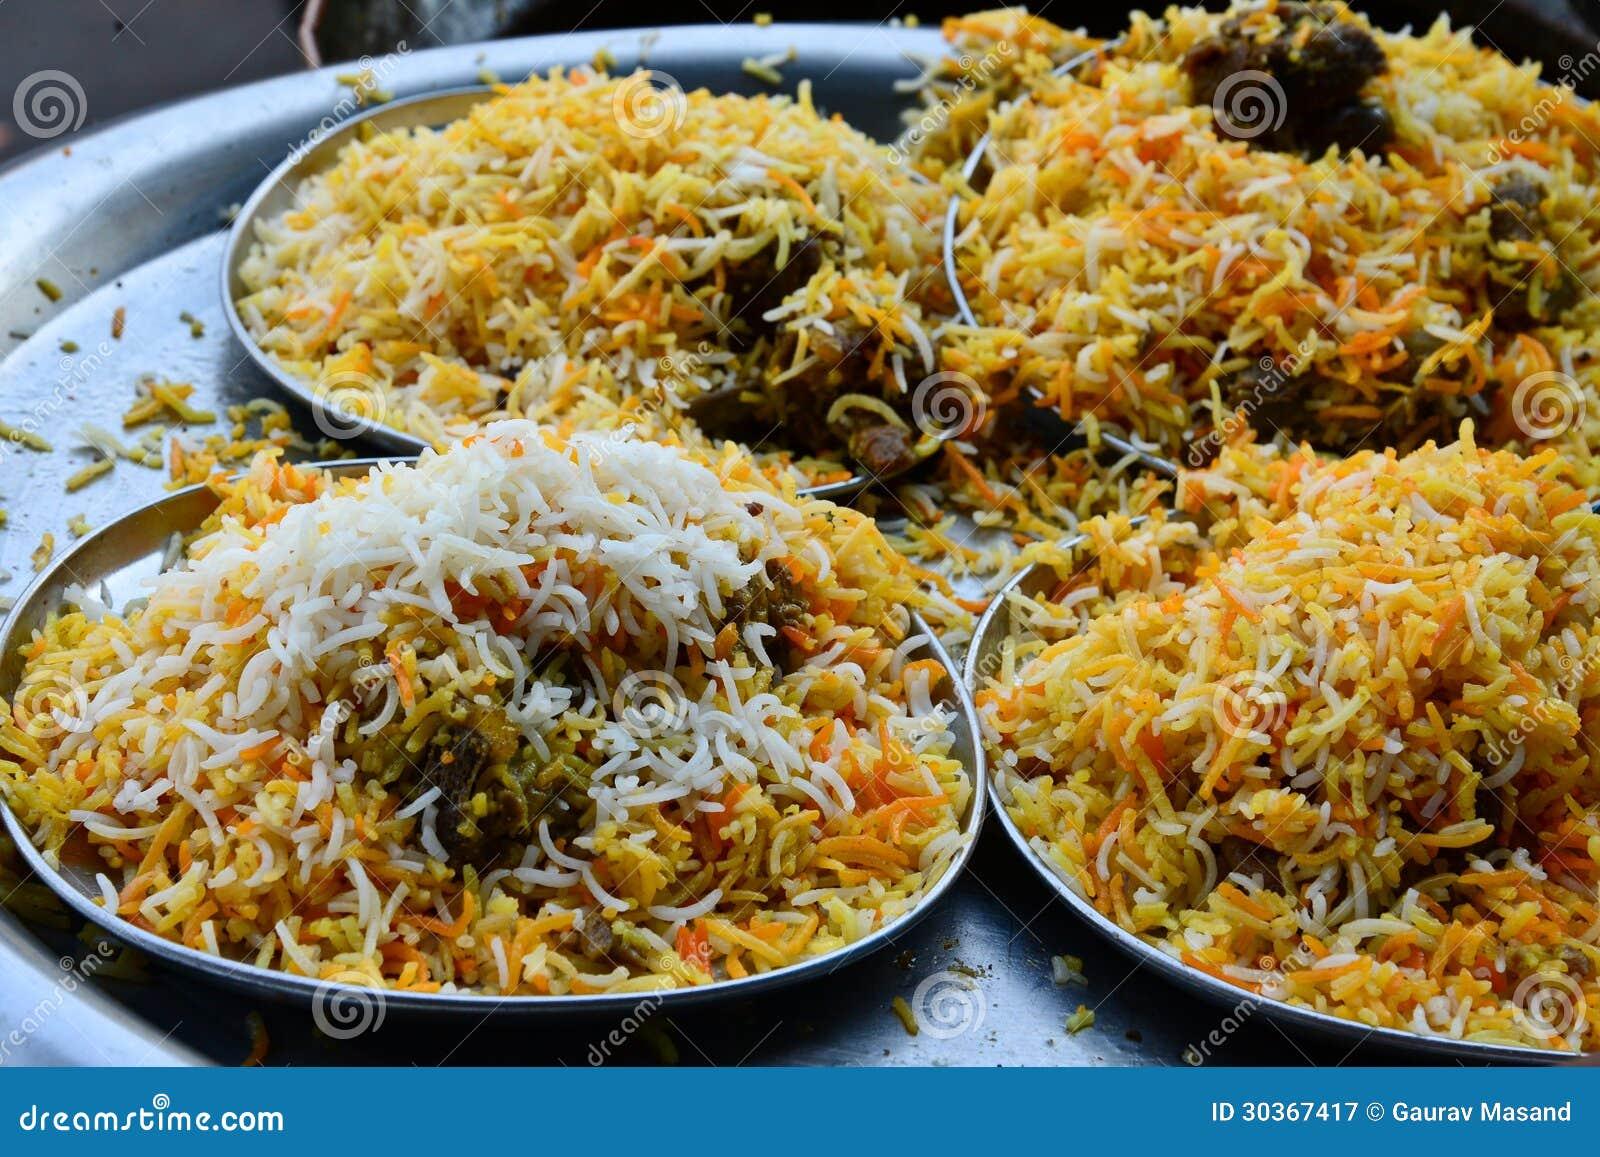 Kabab biryani recipe | sooperchef. Pk sooperchef. Pk.